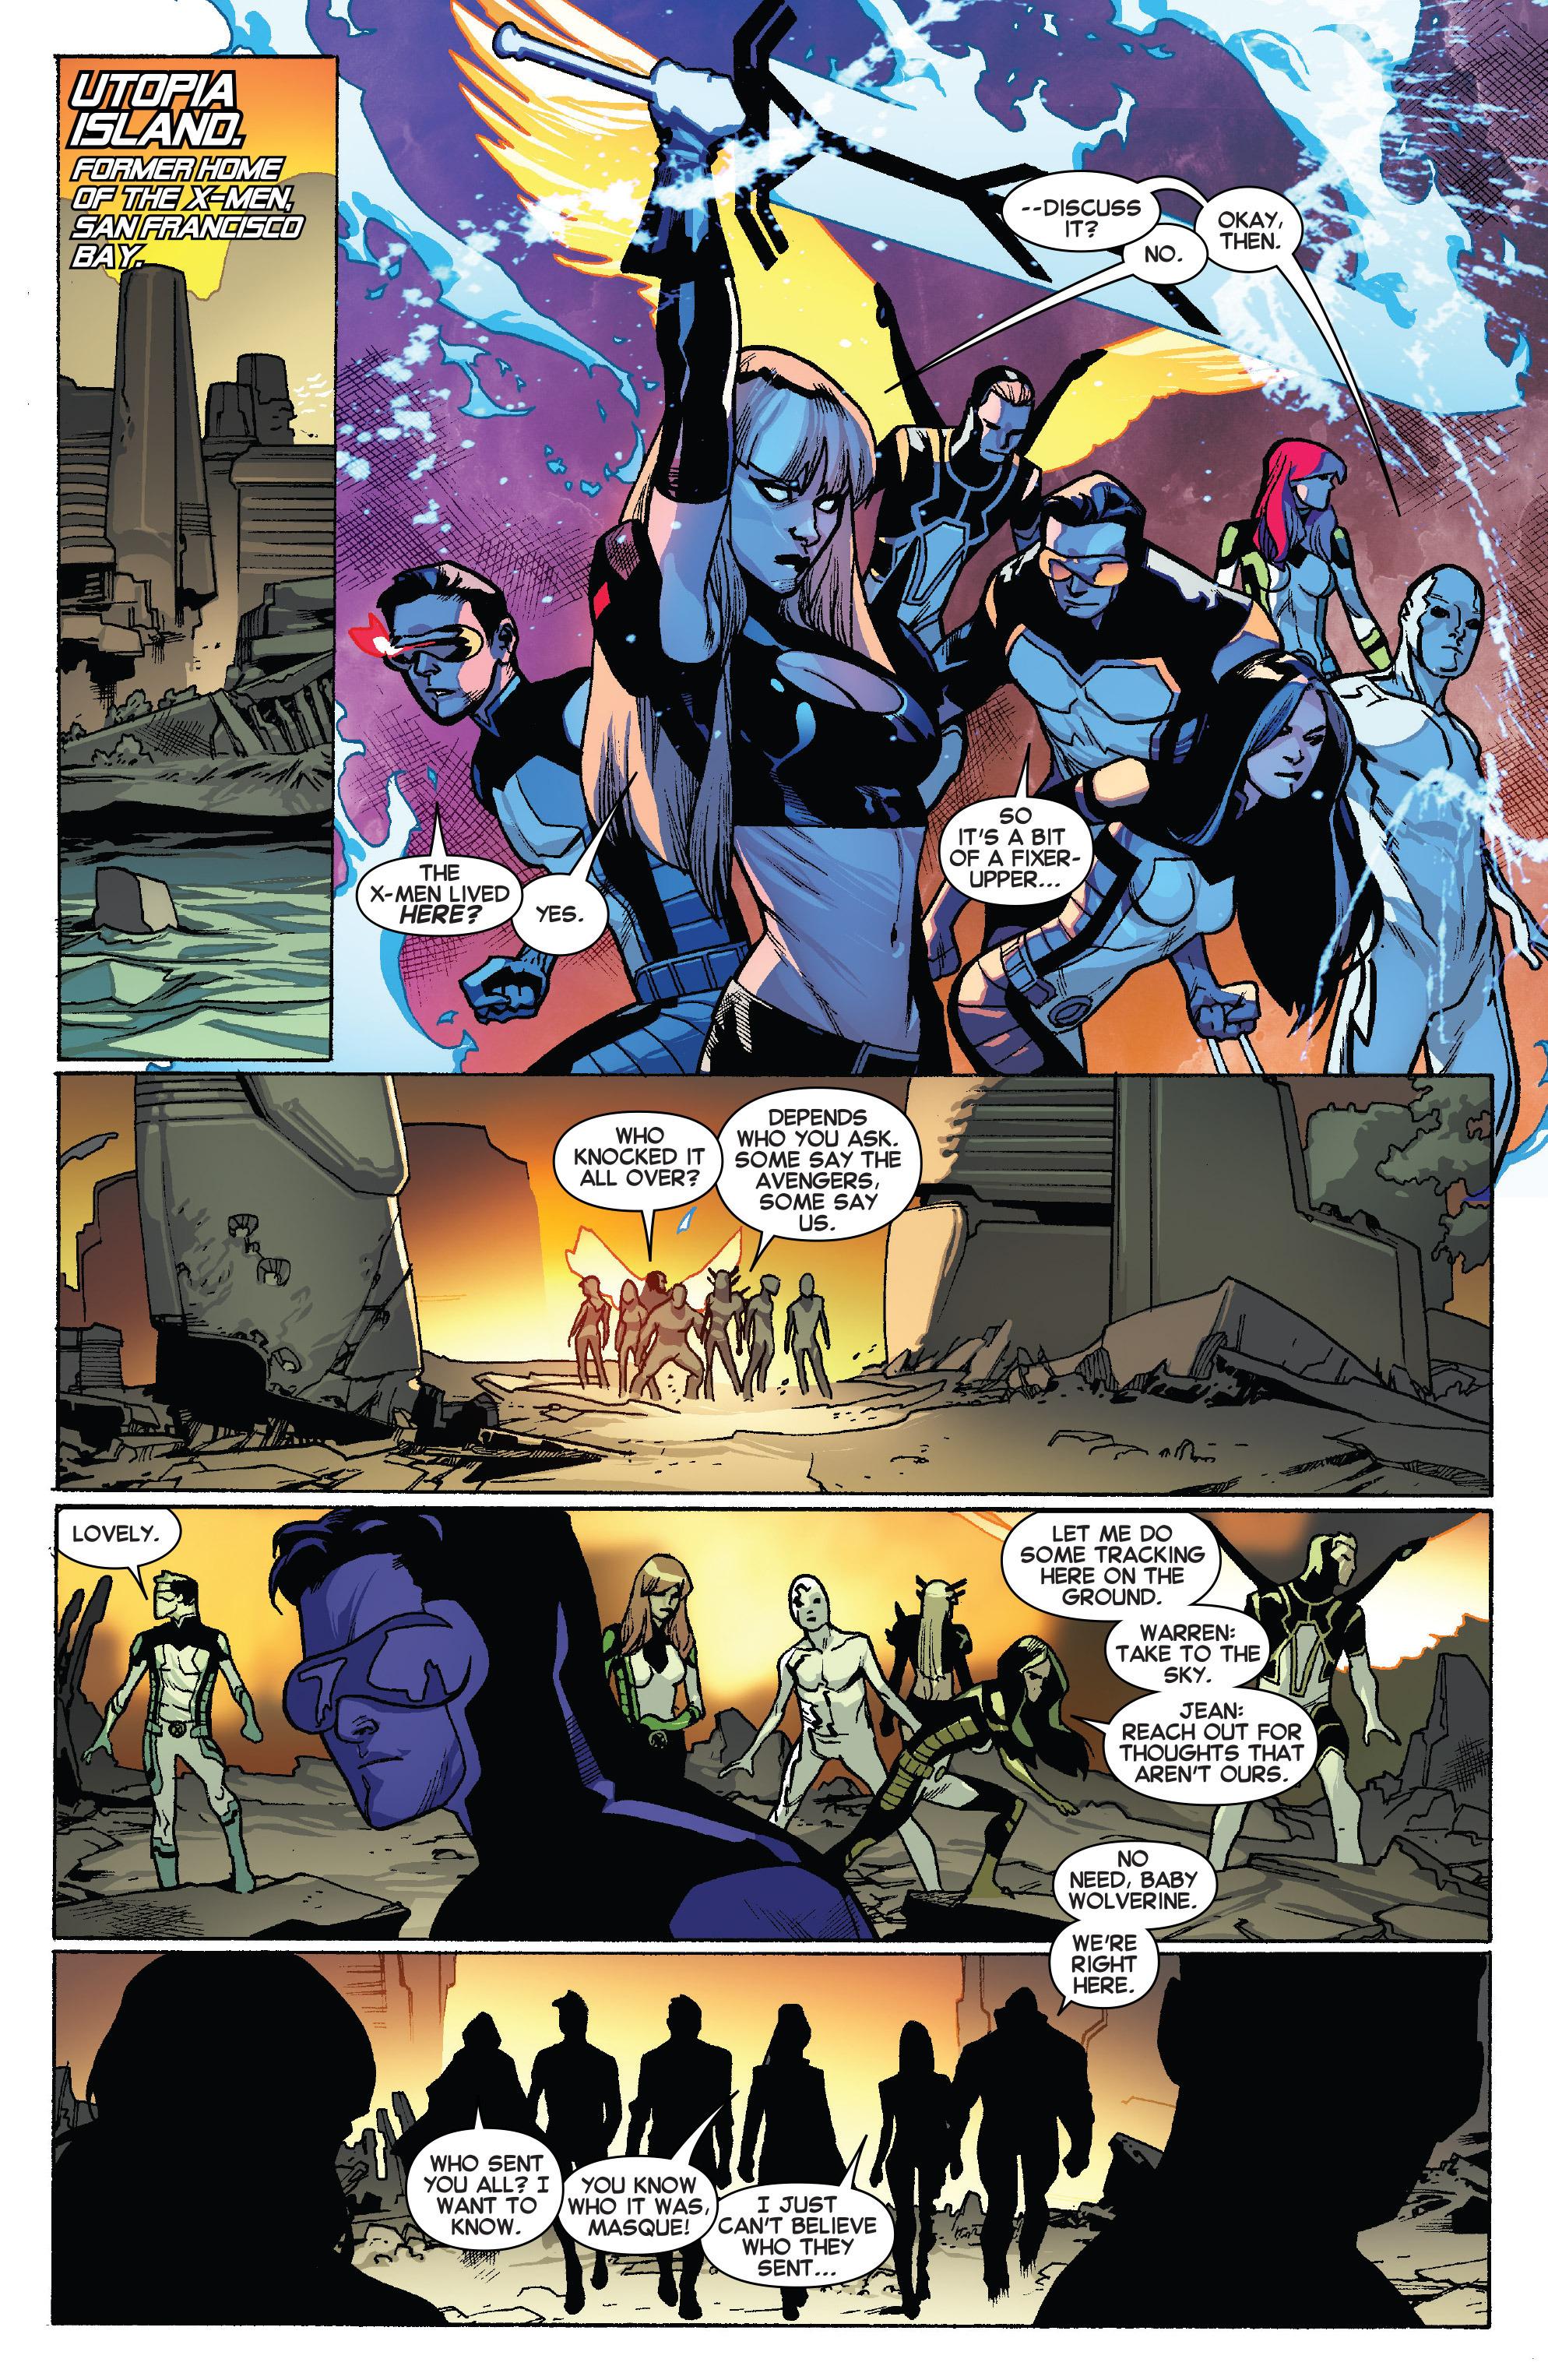 All-New X-Men (2013) chap 41 pic 8